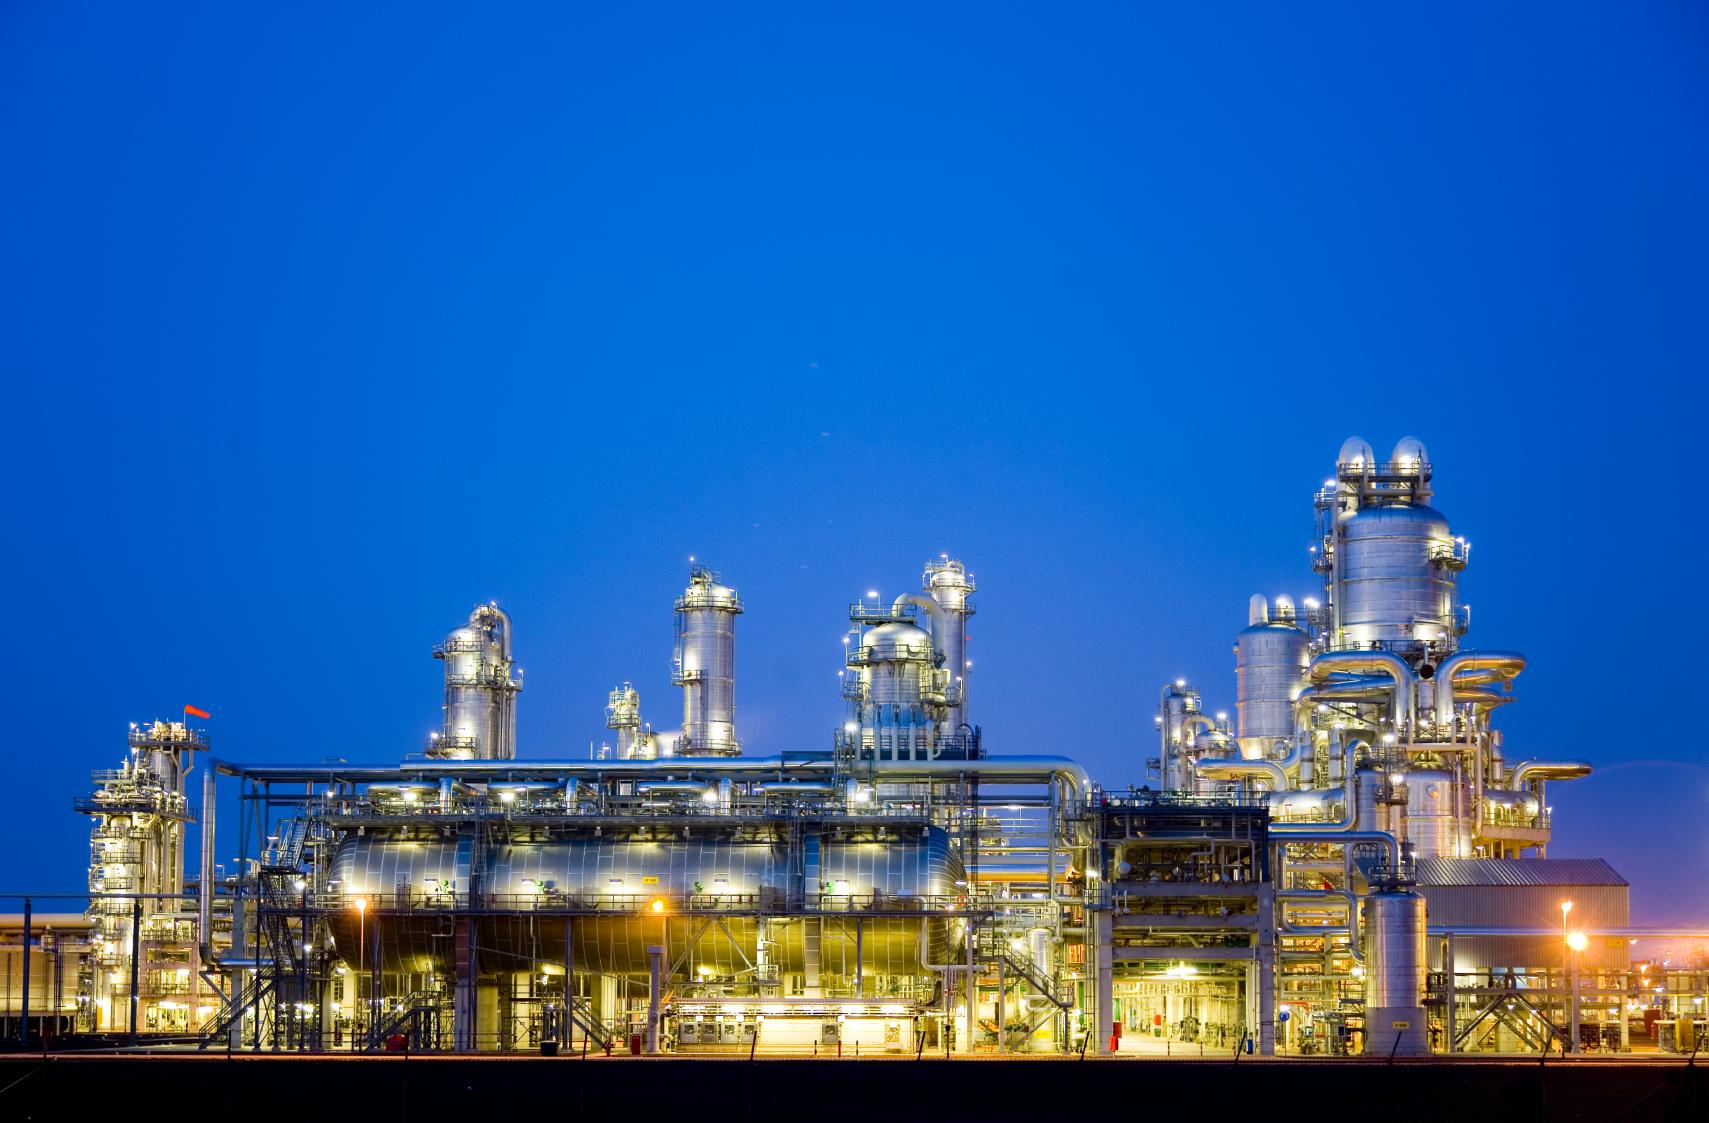 Petrochemical Site